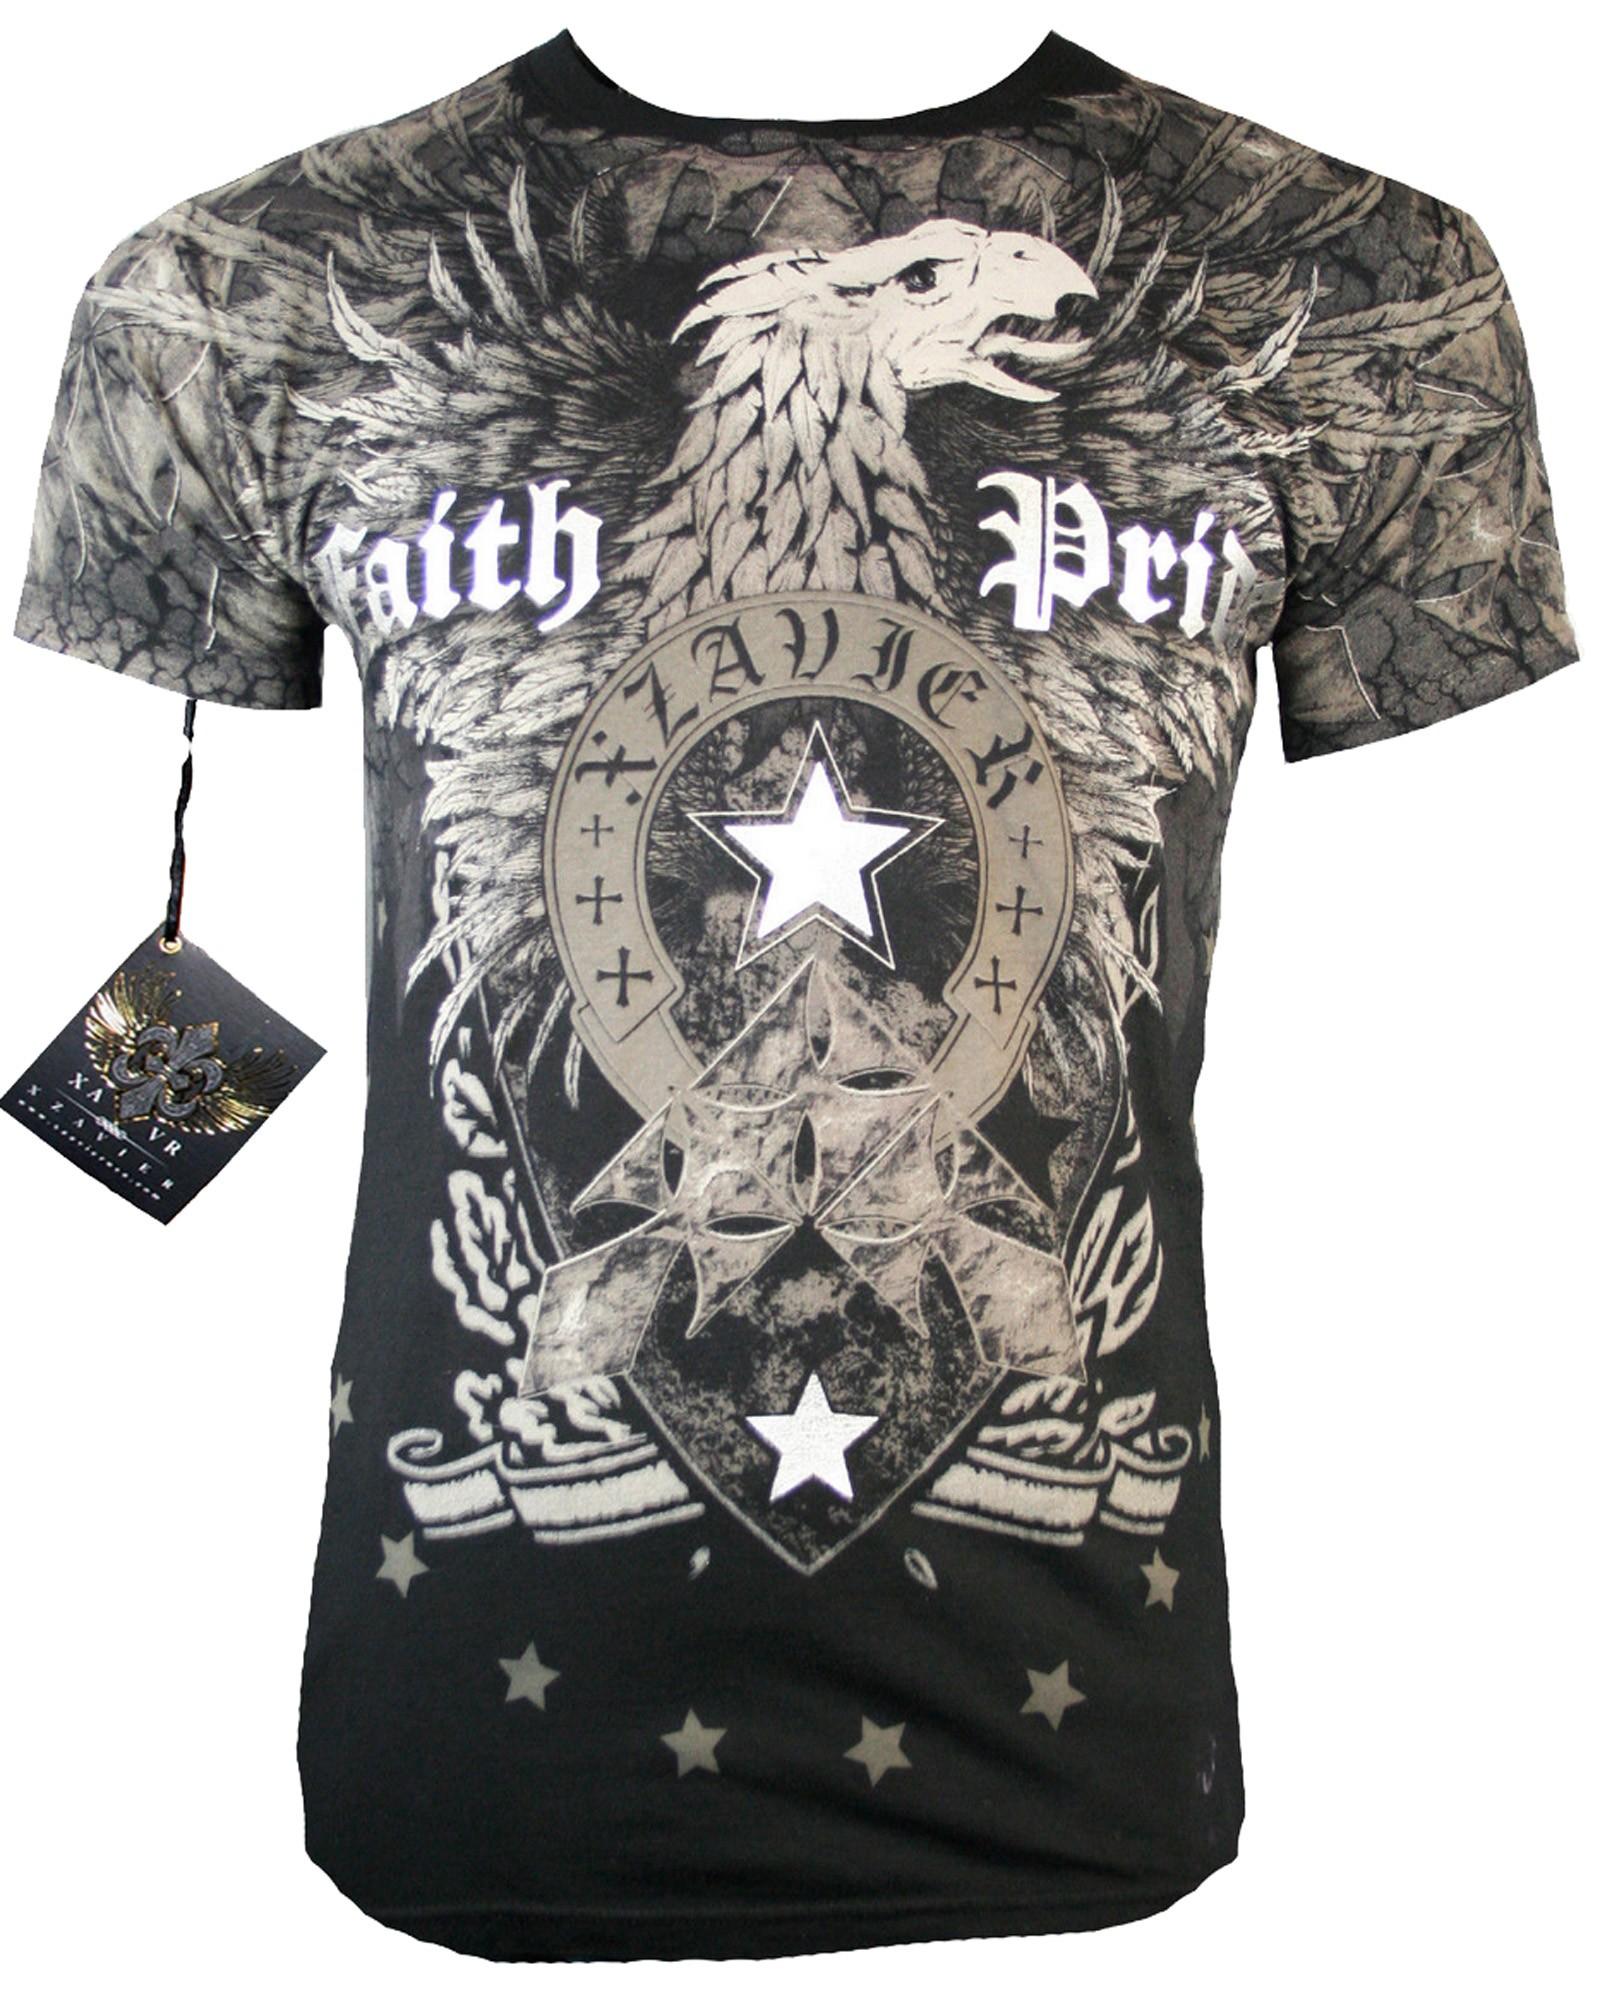 Xzavier - Pride & Courage T-Shirt